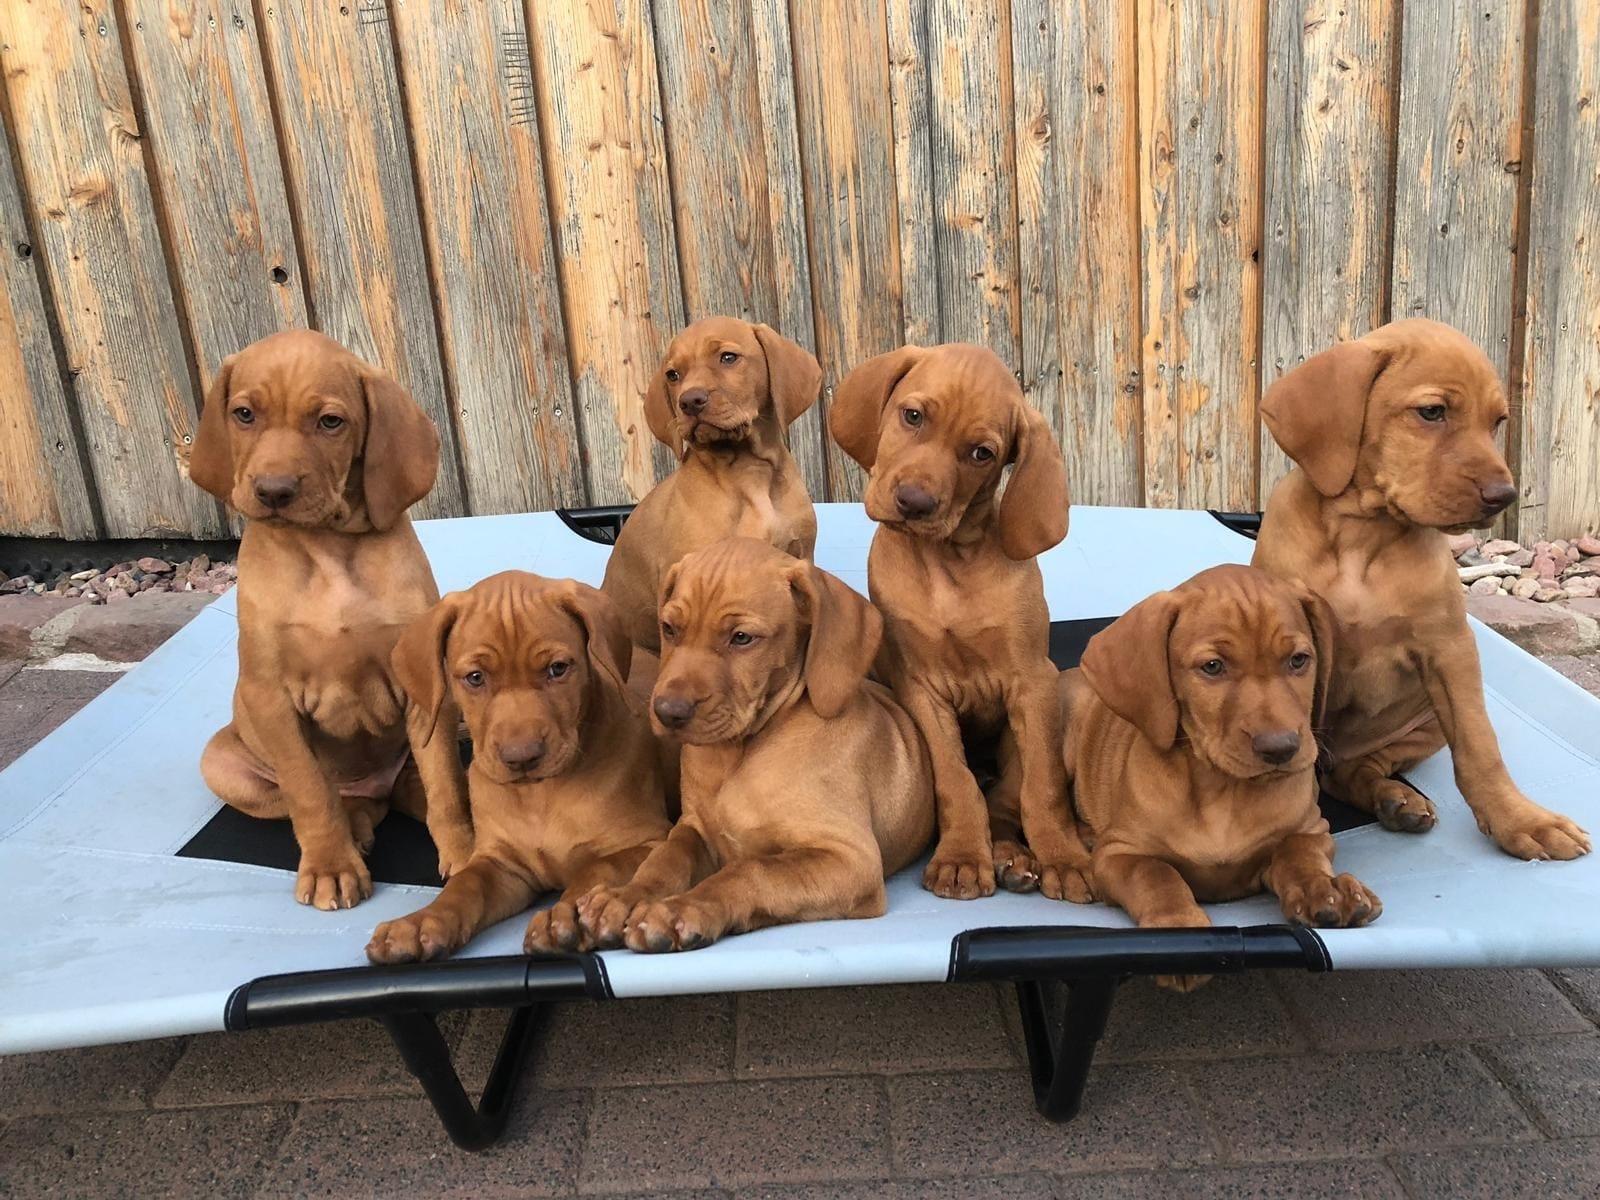 Magyar Vizsla Welpen Rassehunde Hunde Welpen Haustier Anzeiger